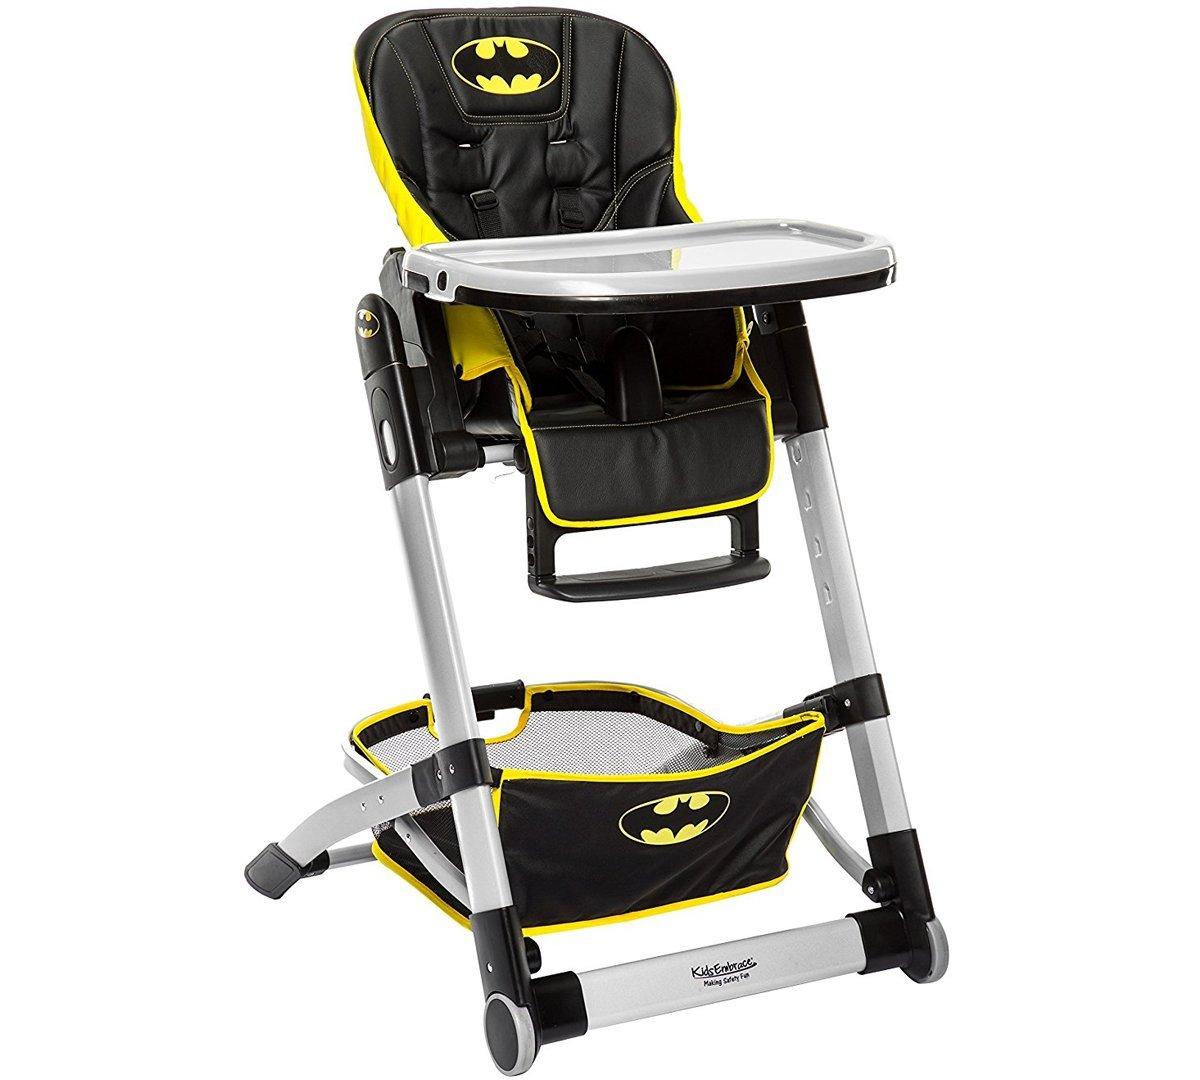 KidsEmbrace DC Comics Batman Deluxe High Chair 6601BATCAN